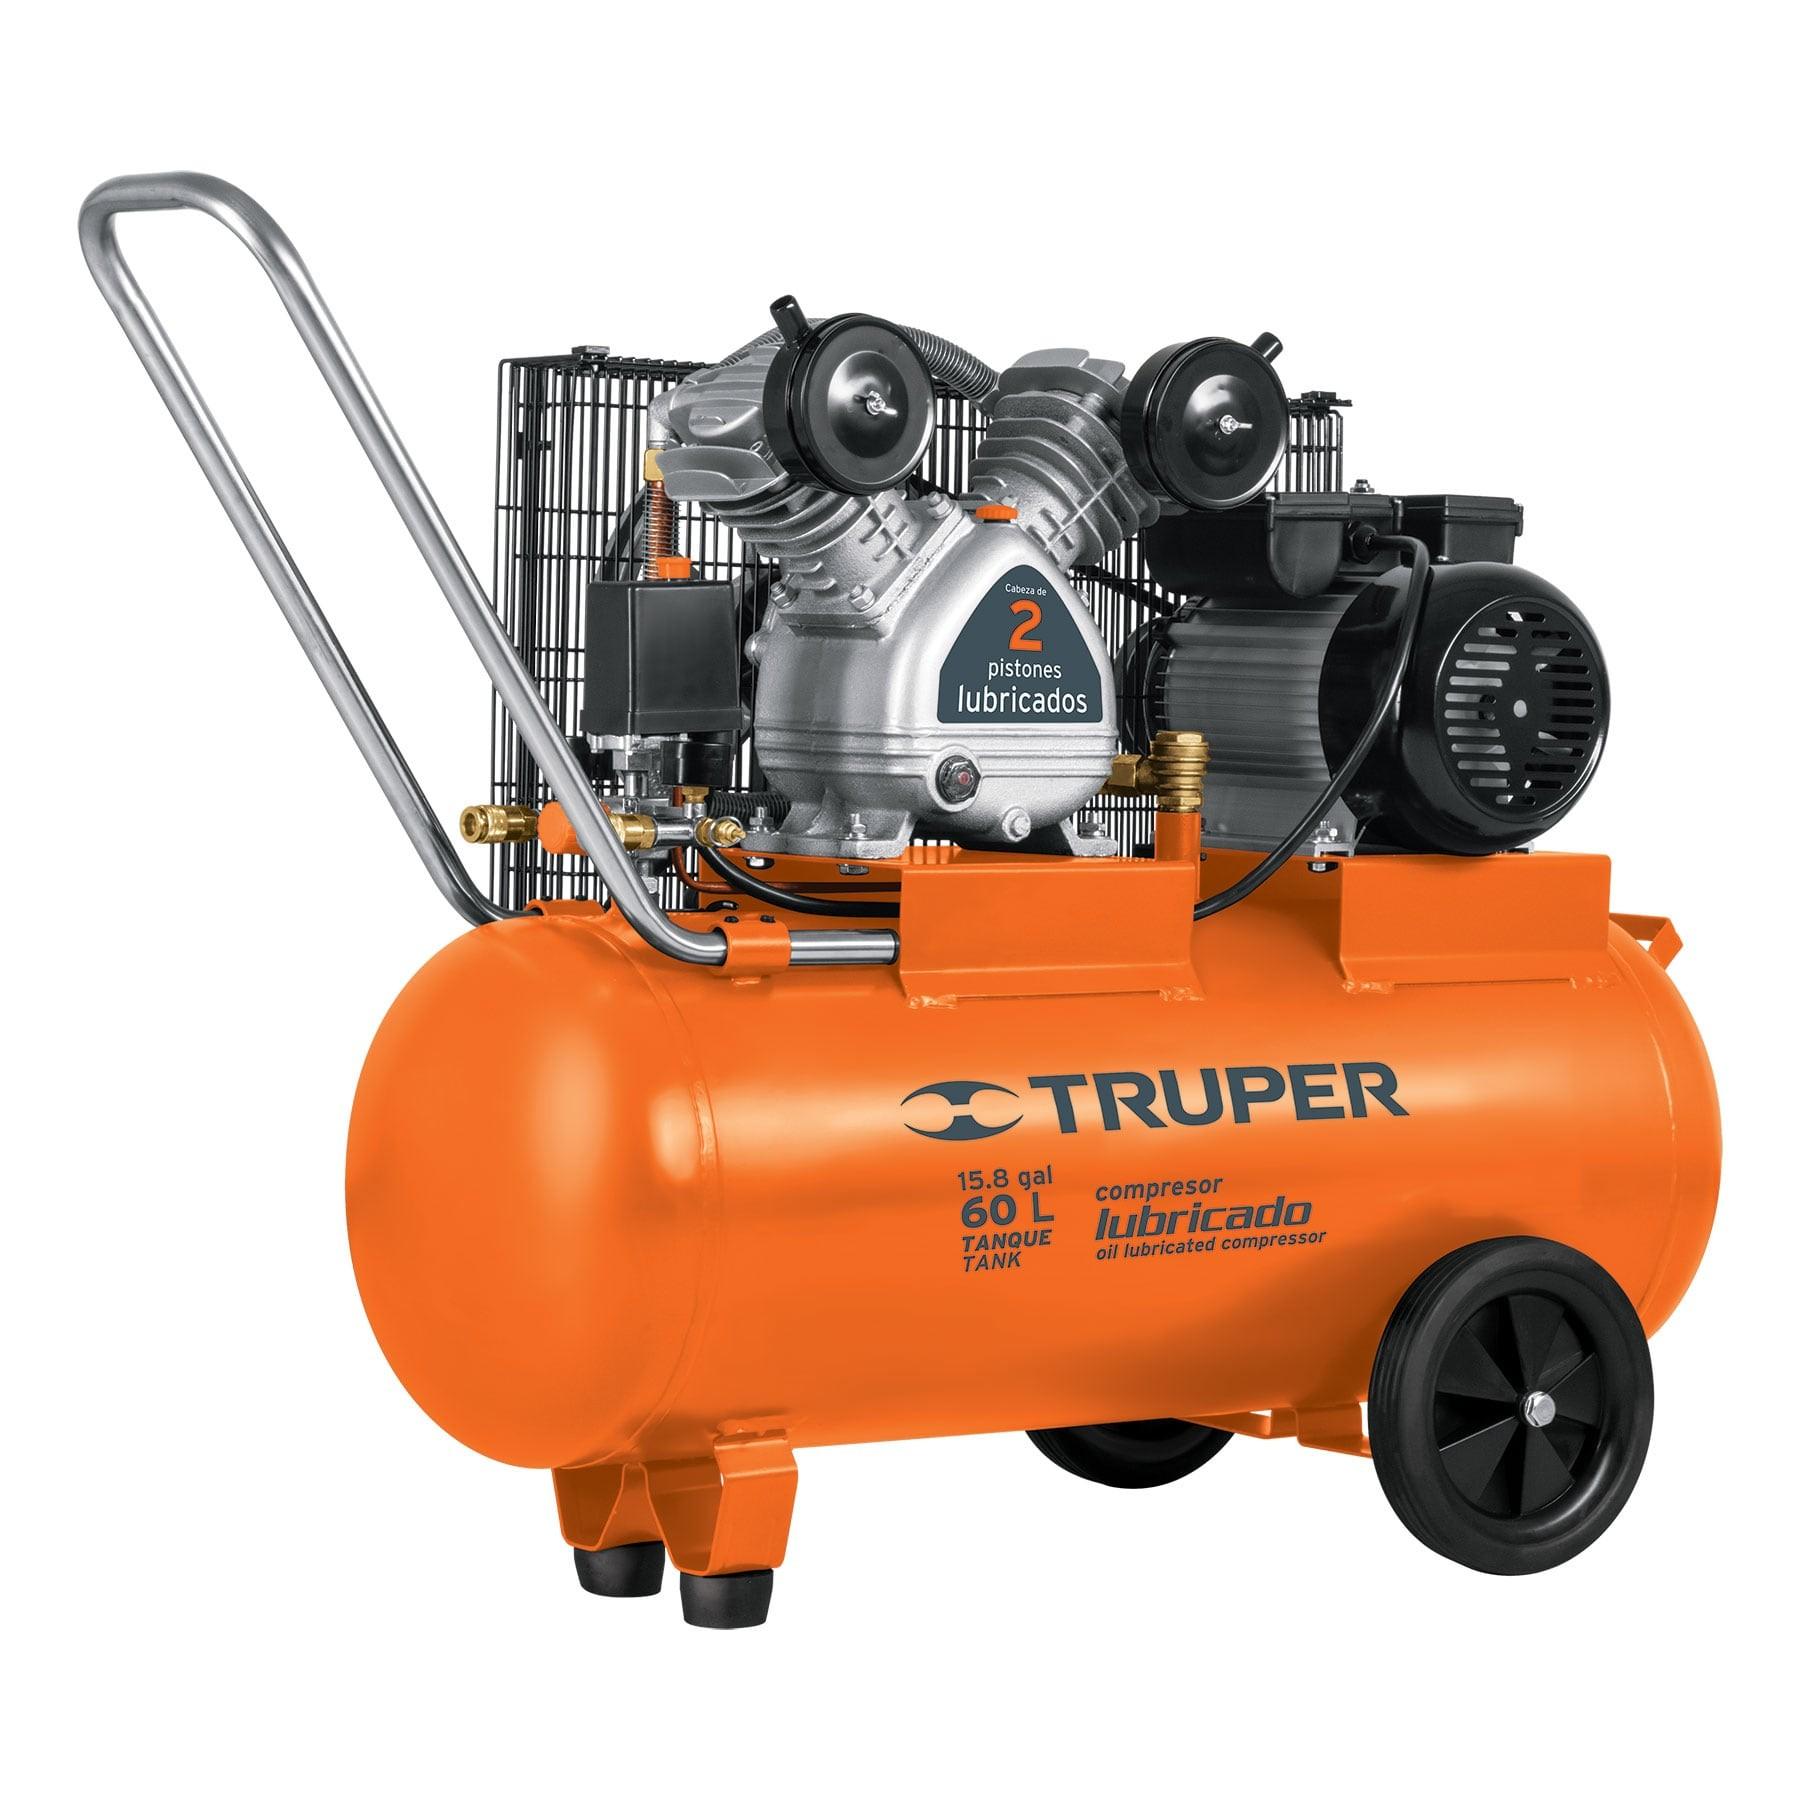 Compresor horizontal 60 L, 4 HP (potencia máxima), 127 V